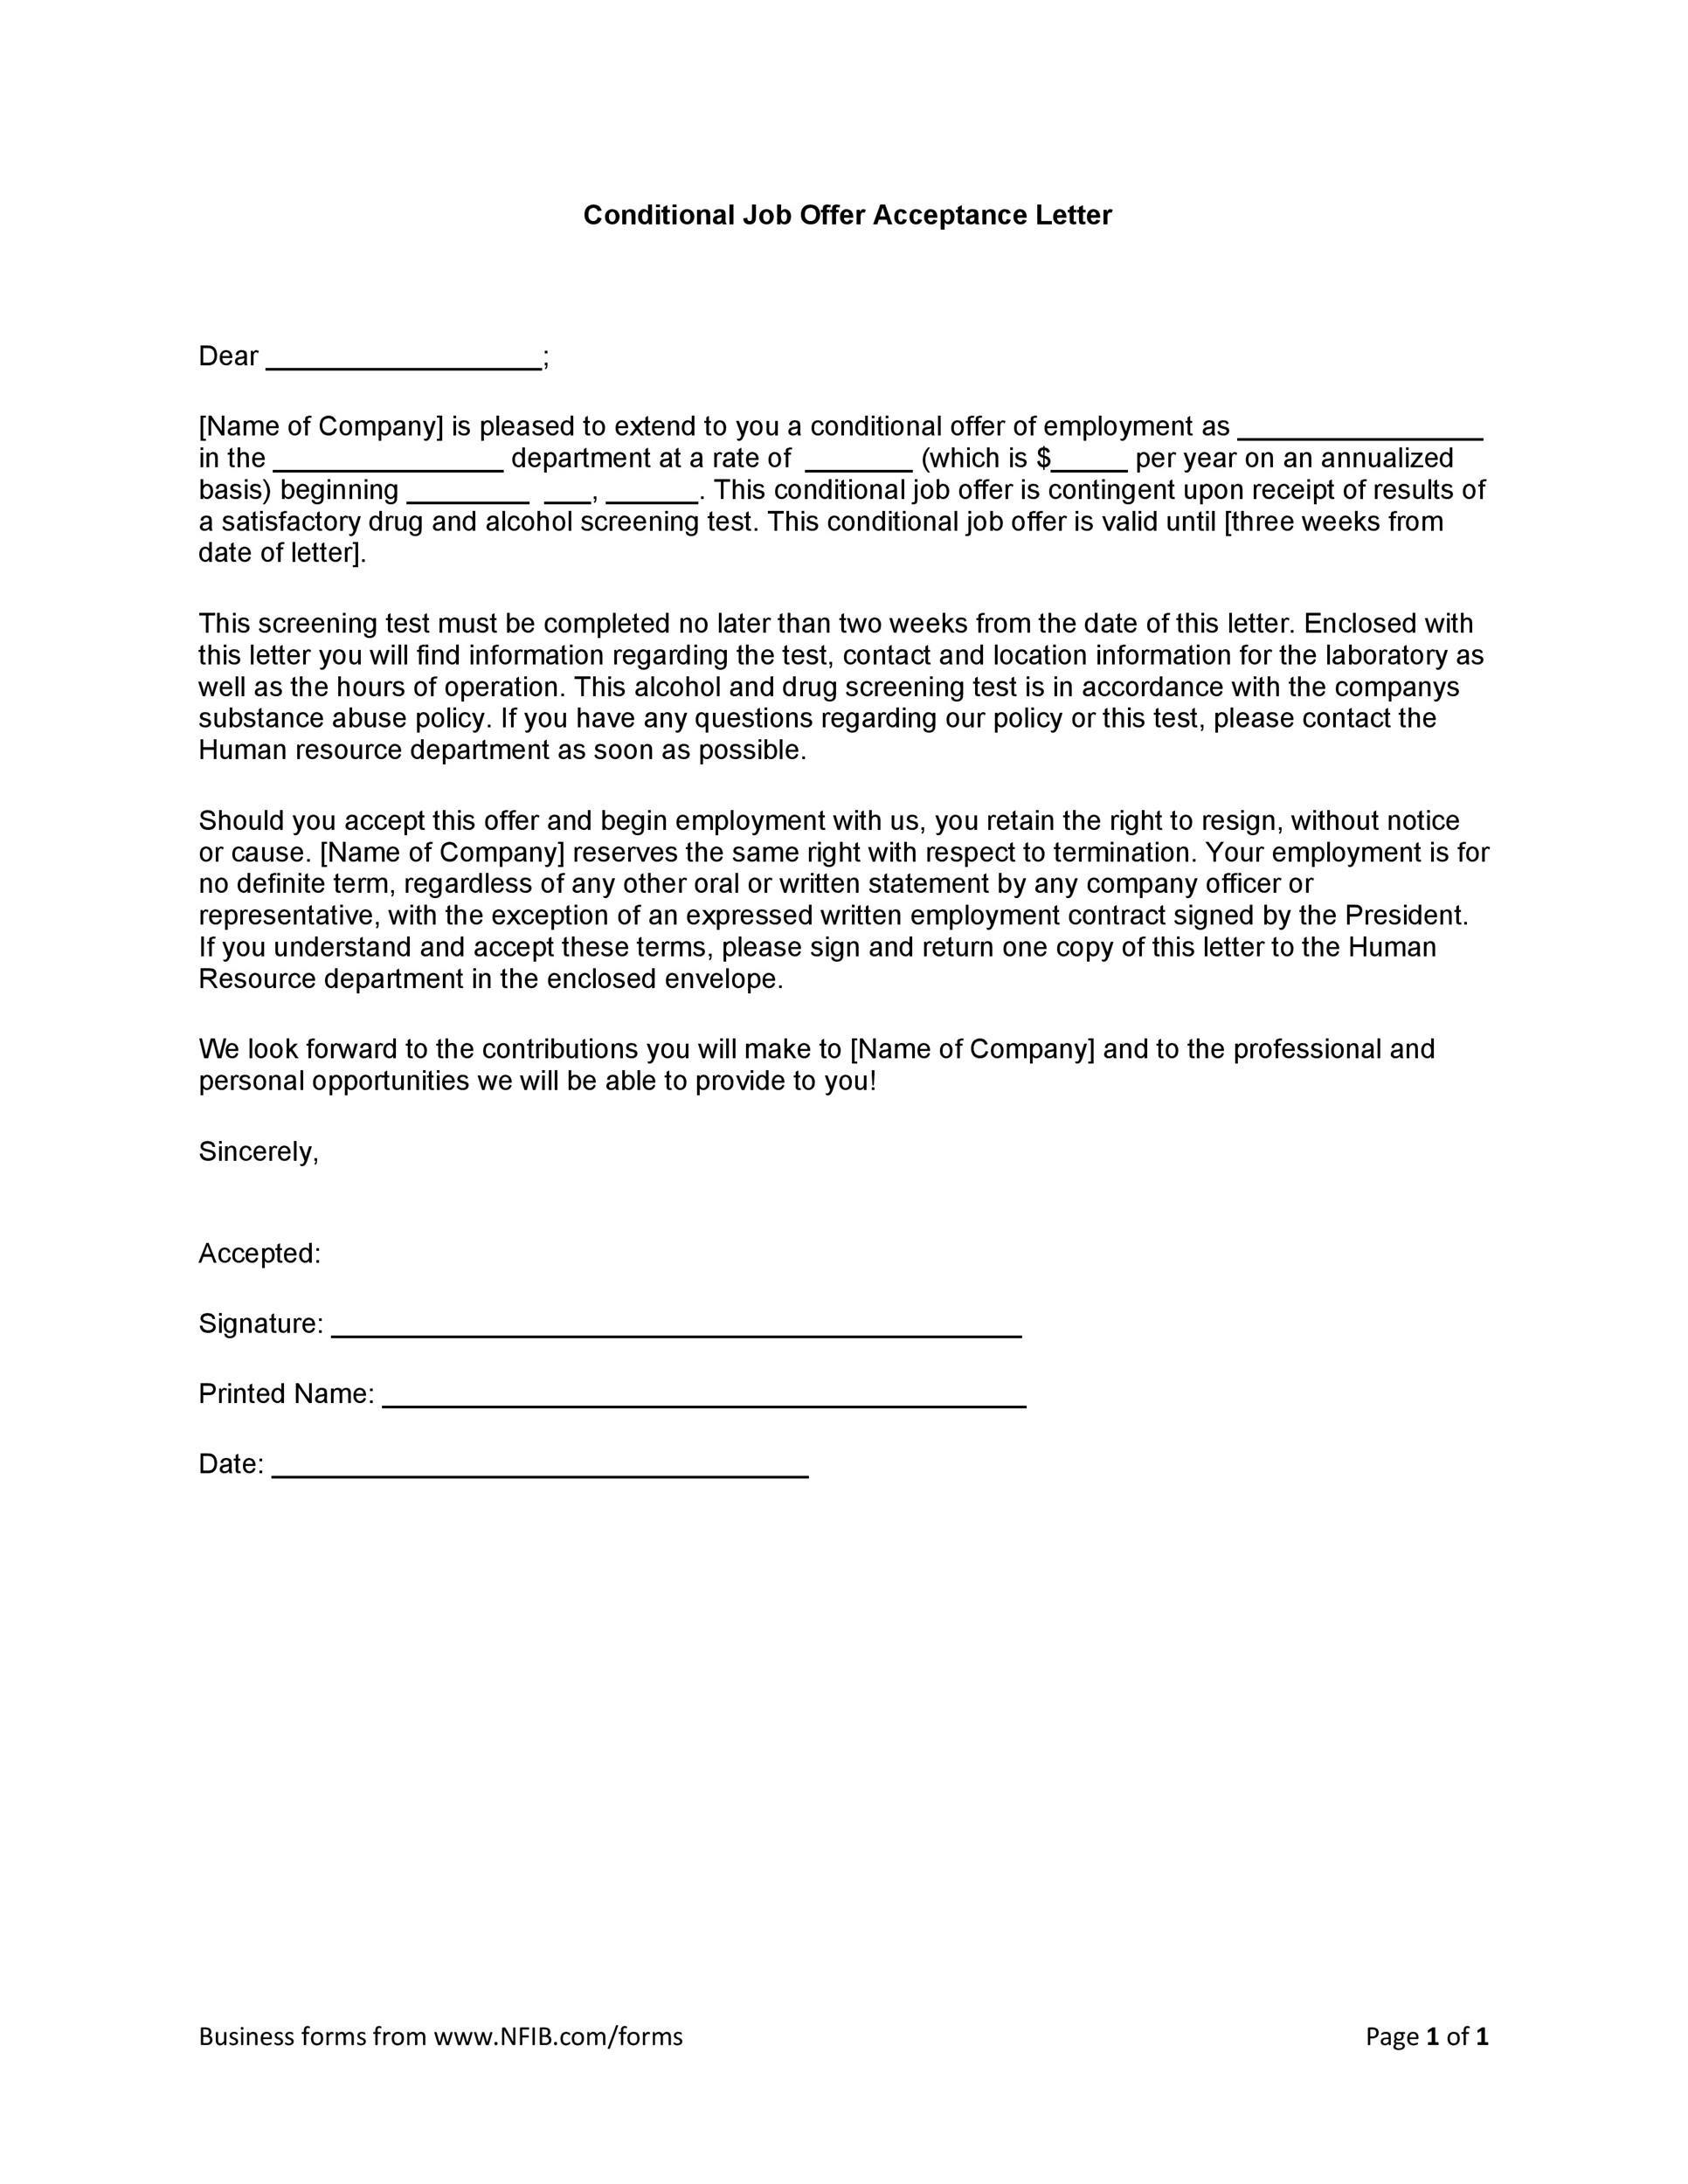 Free job acceptance letter 20